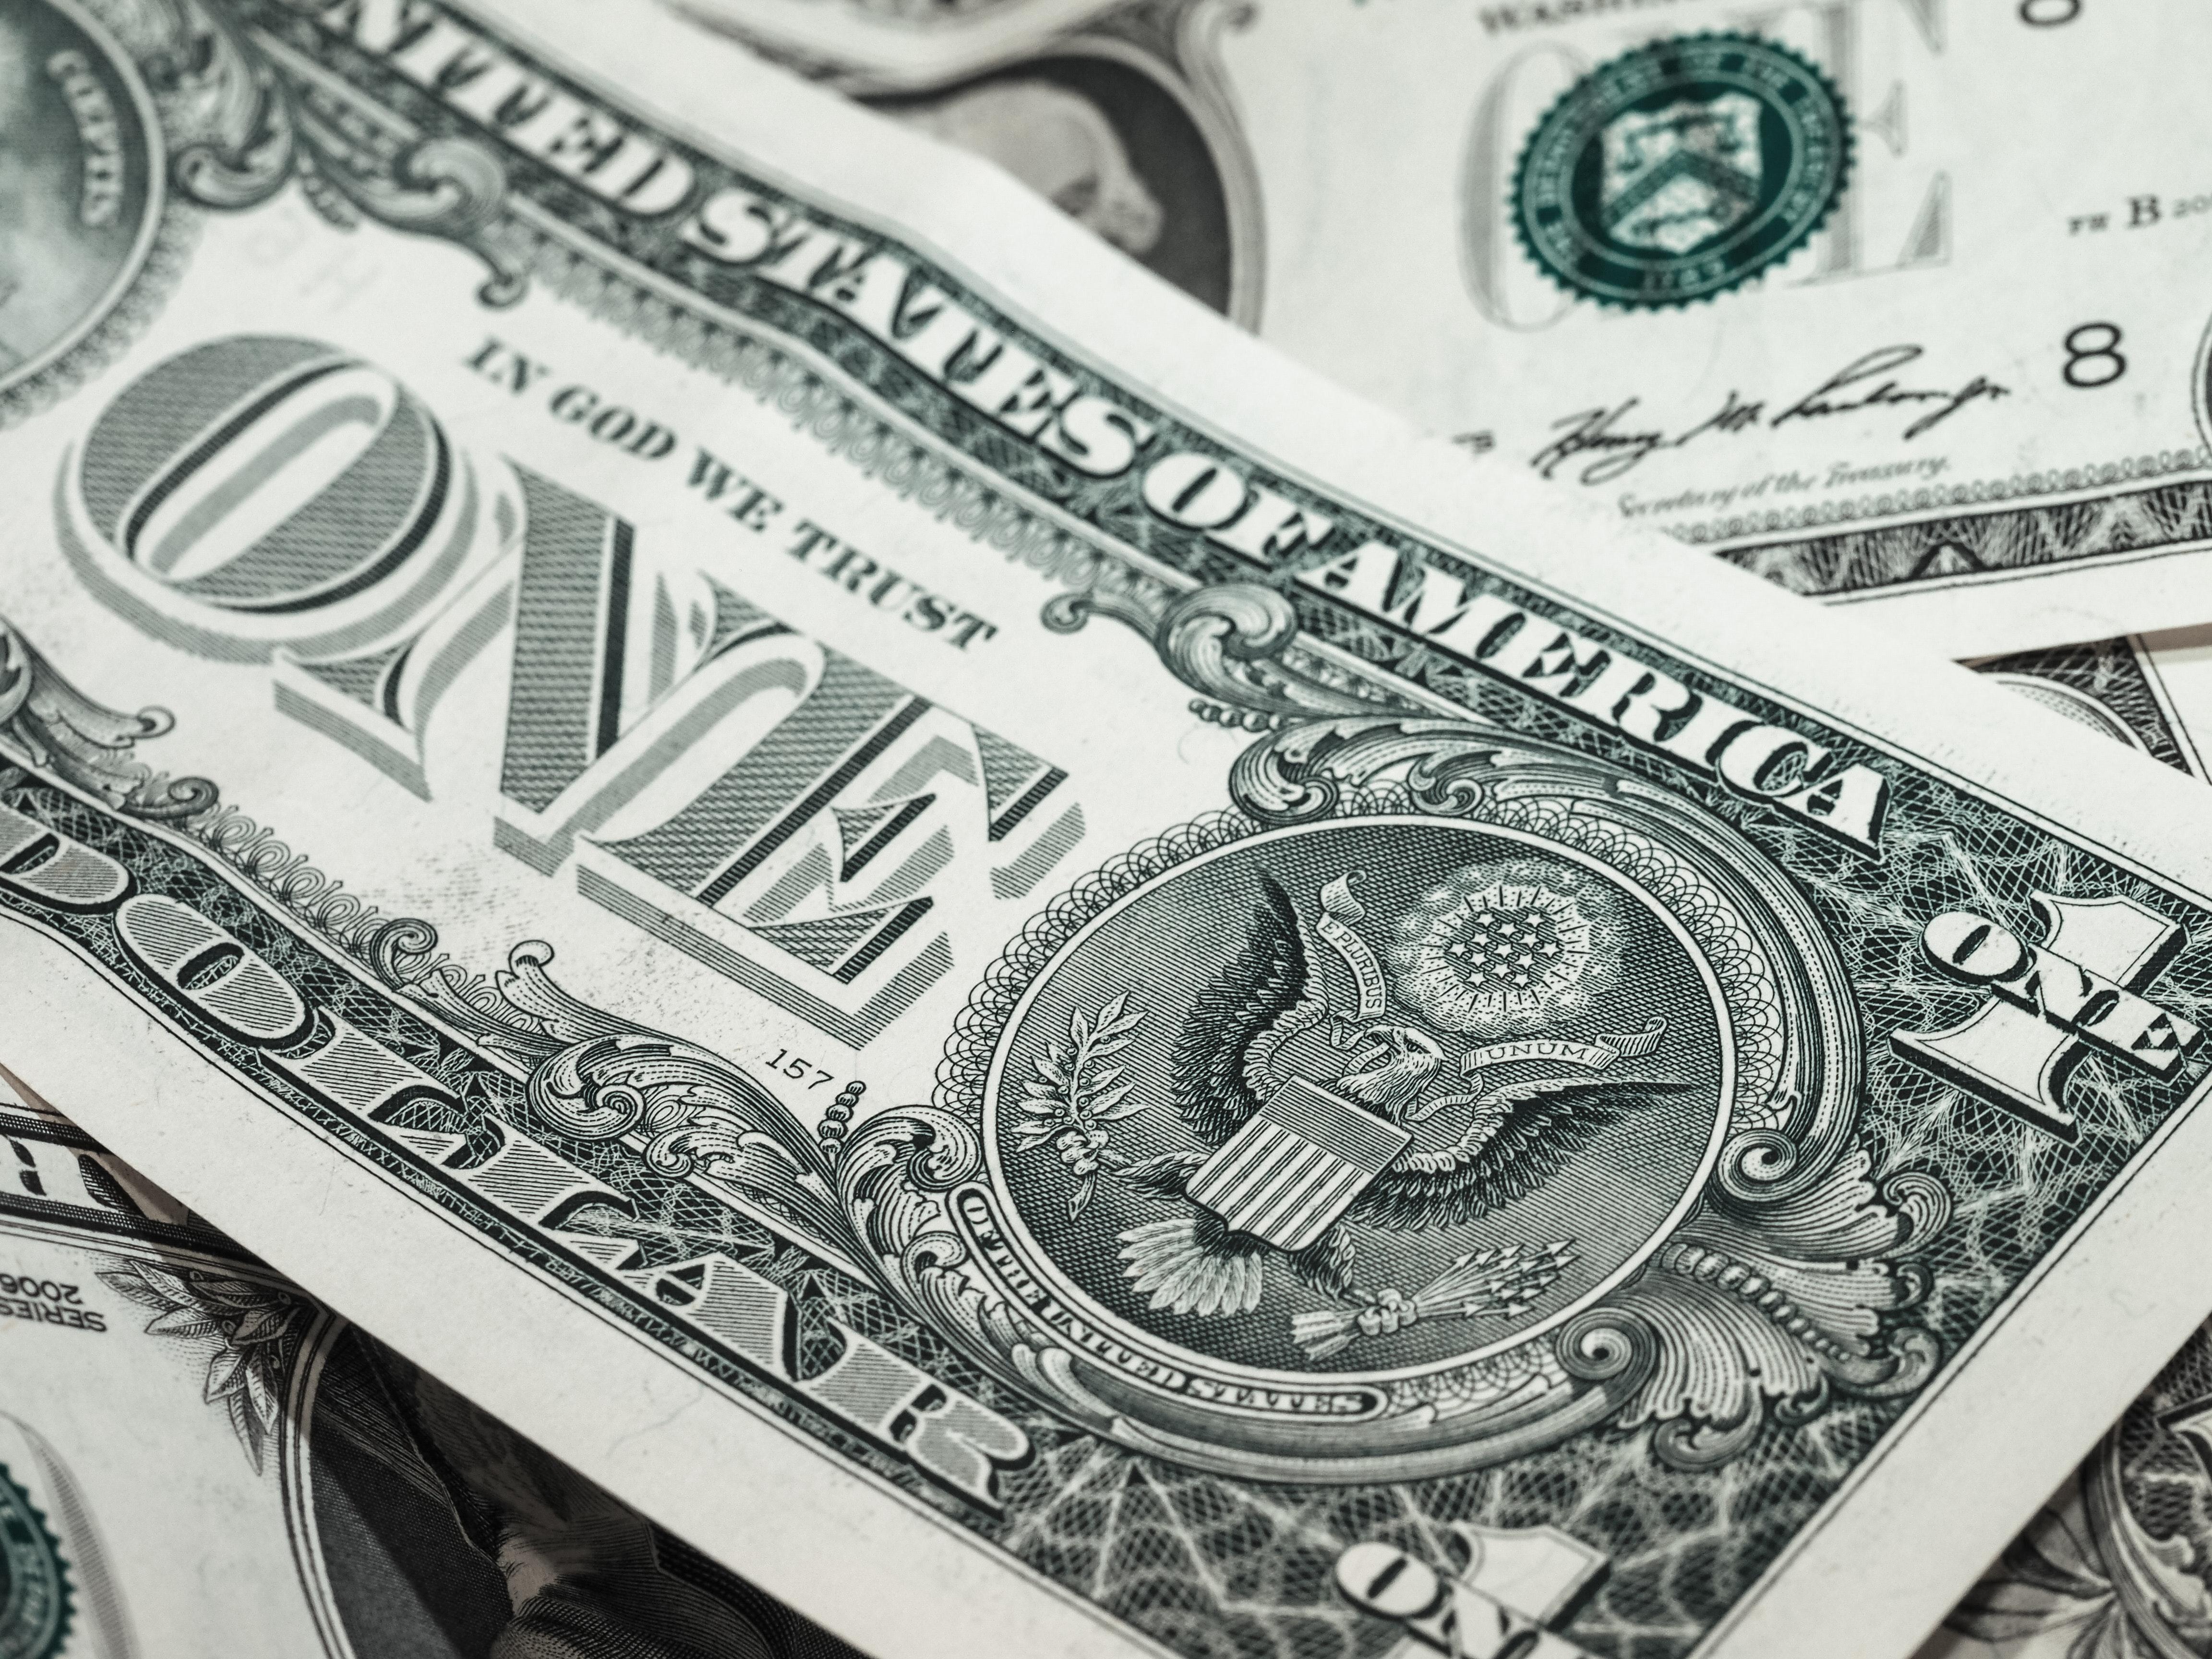 1 u.s. dollar bill photo